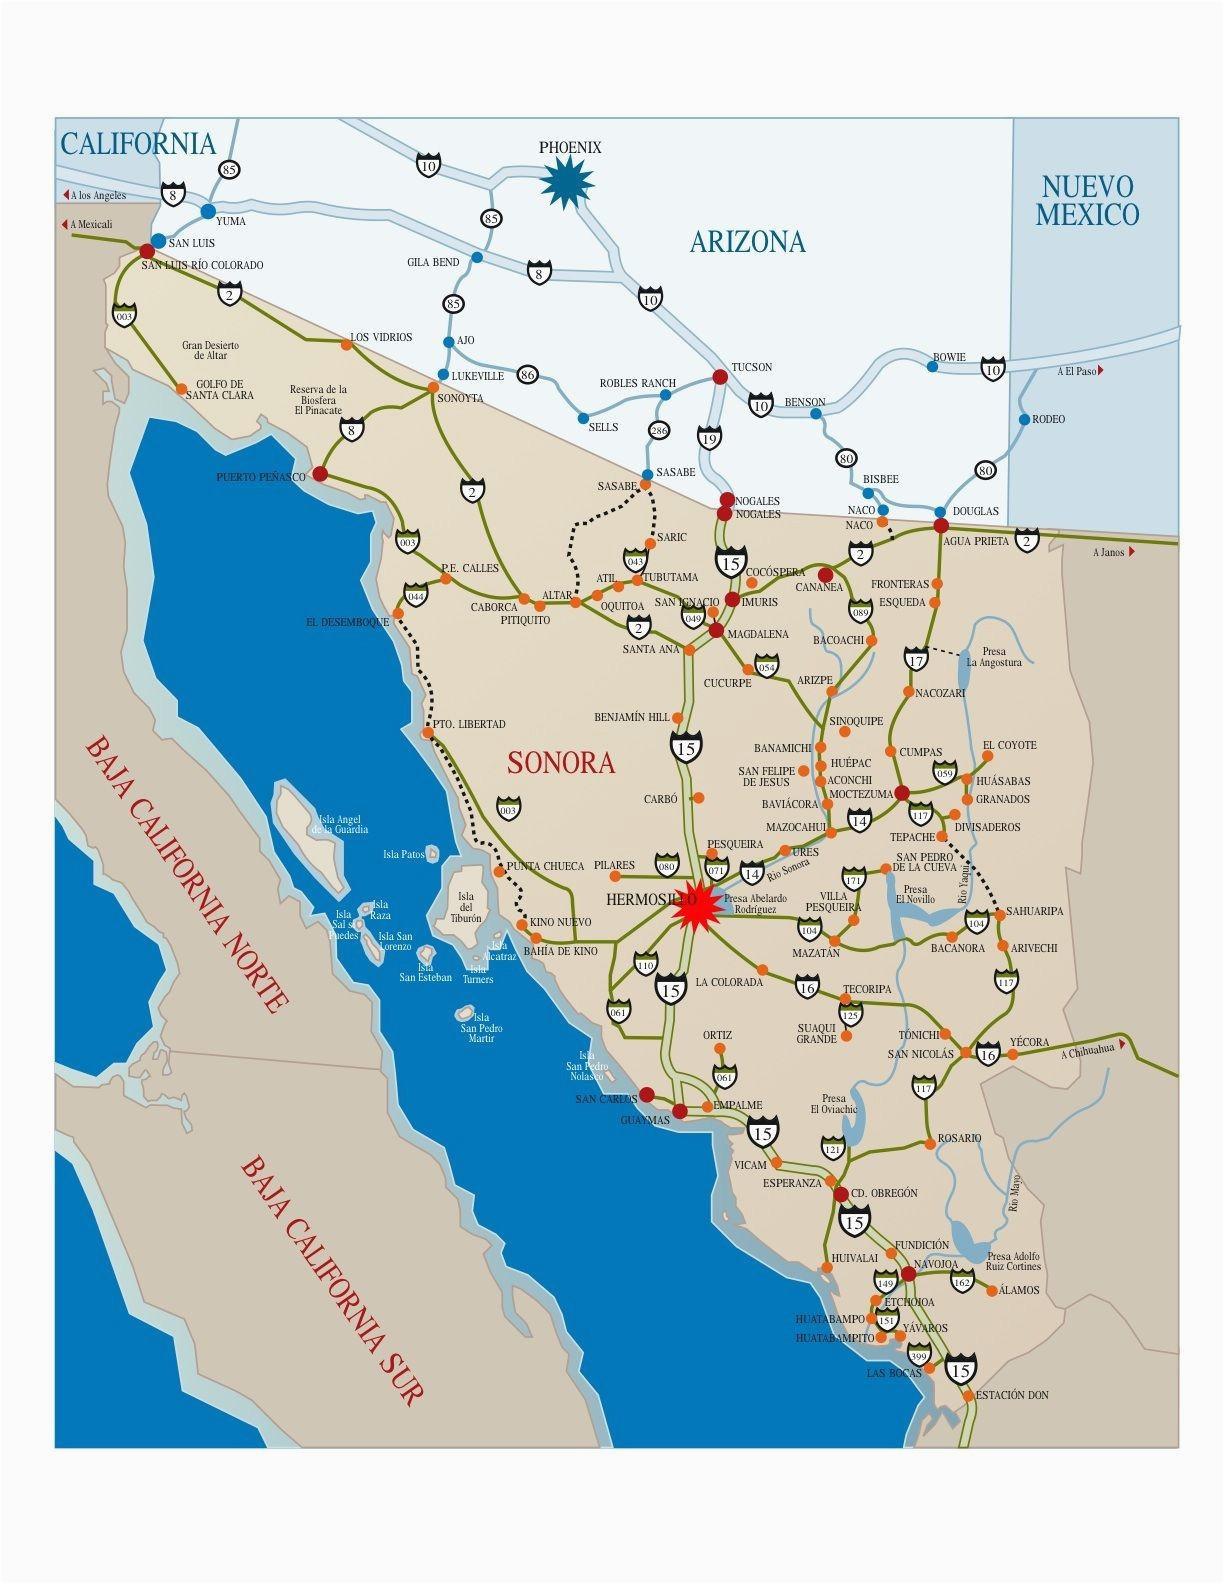 Baja California norte Map United States Map Baja California New Map Baja California Mexico